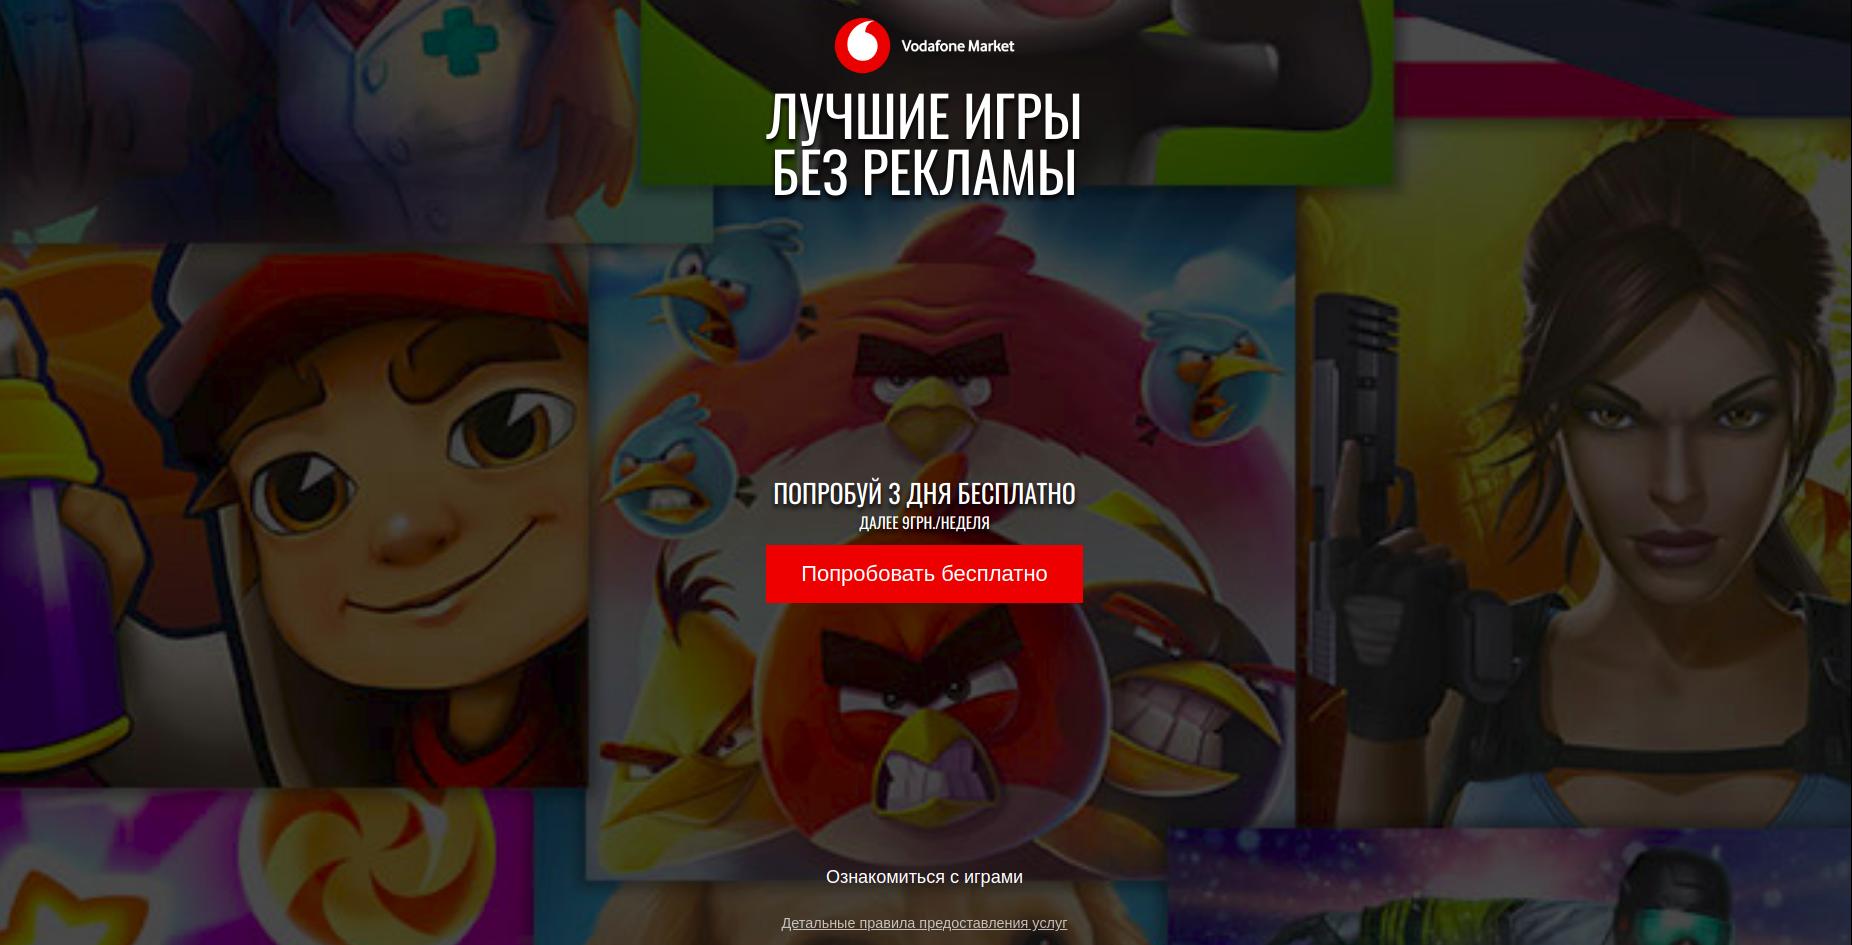 Сайт водафон маркет